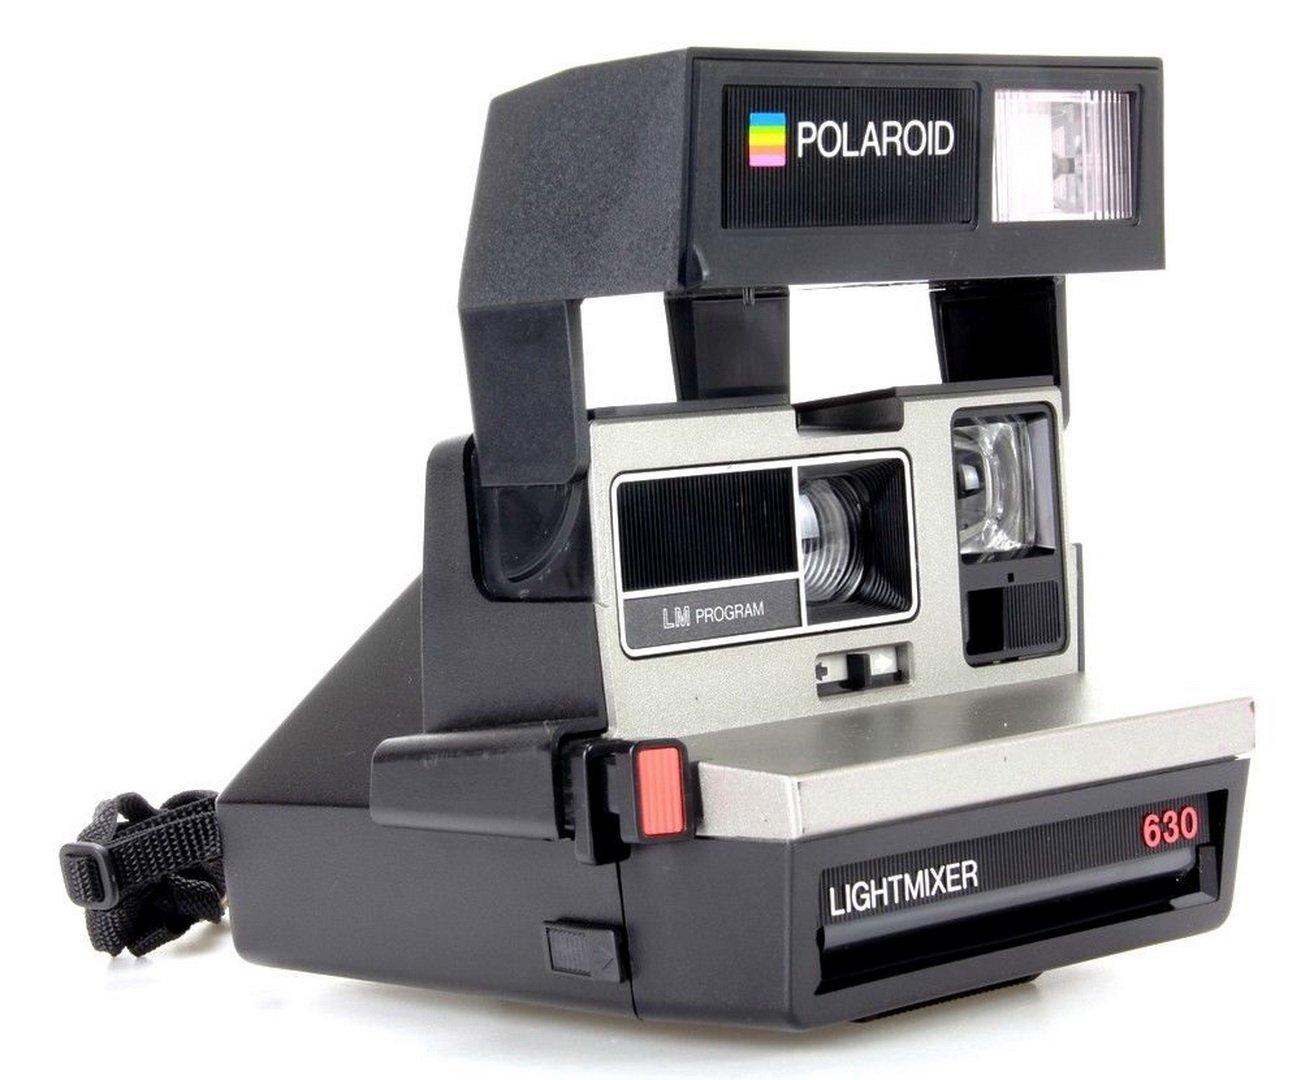 polaroid lightmixer 630 1 990. Black Bedroom Furniture Sets. Home Design Ideas